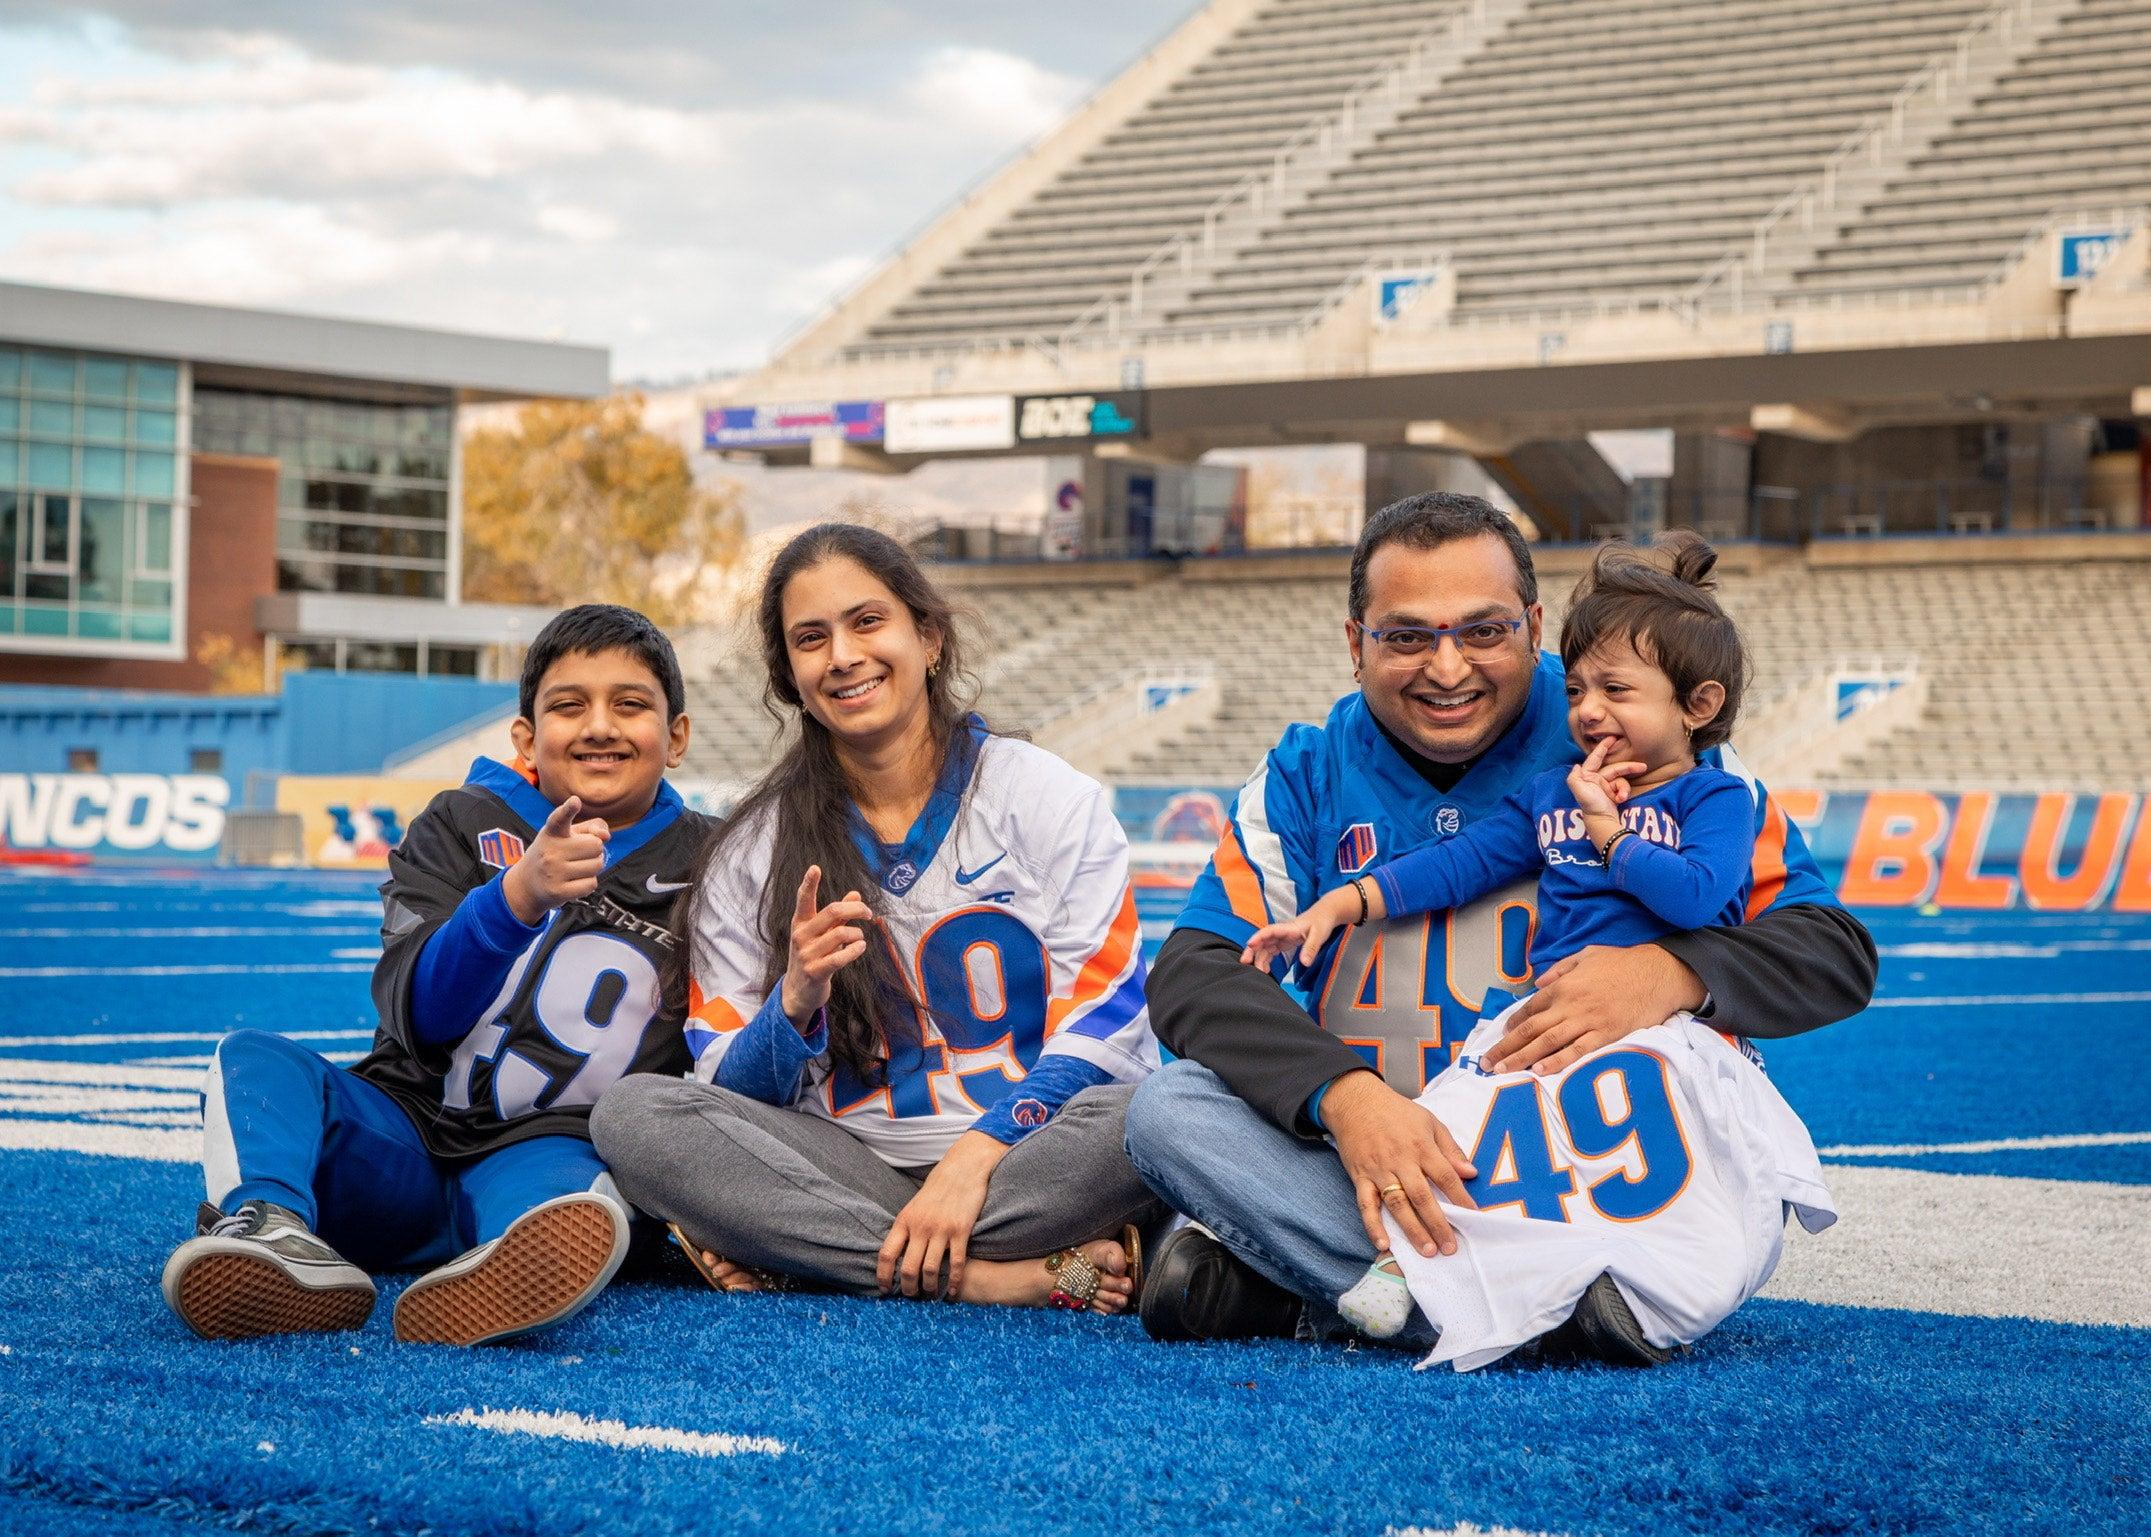 Krishna Pakala and his family